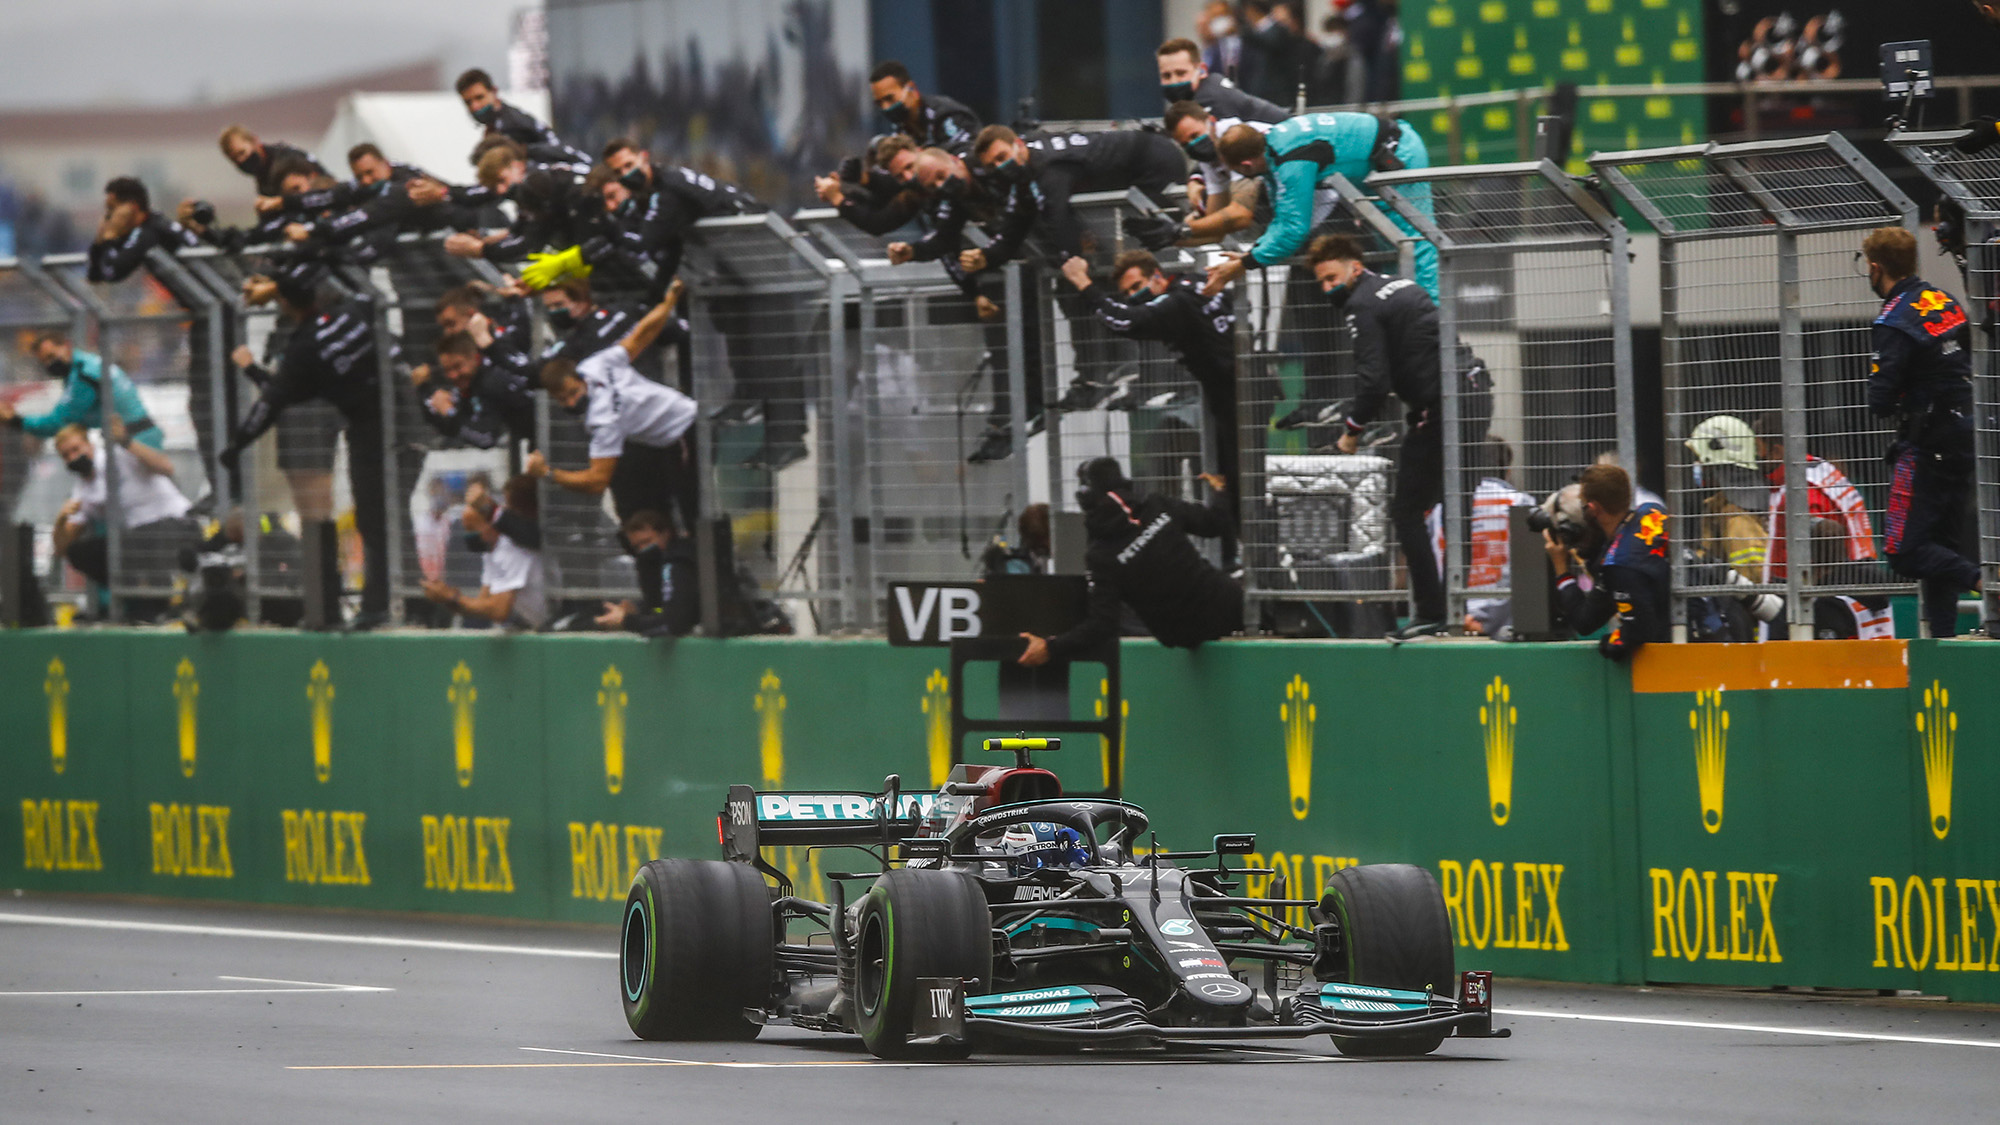 Valtteri Bottas crosses the line to win the 2021 Turkish Grand Prix